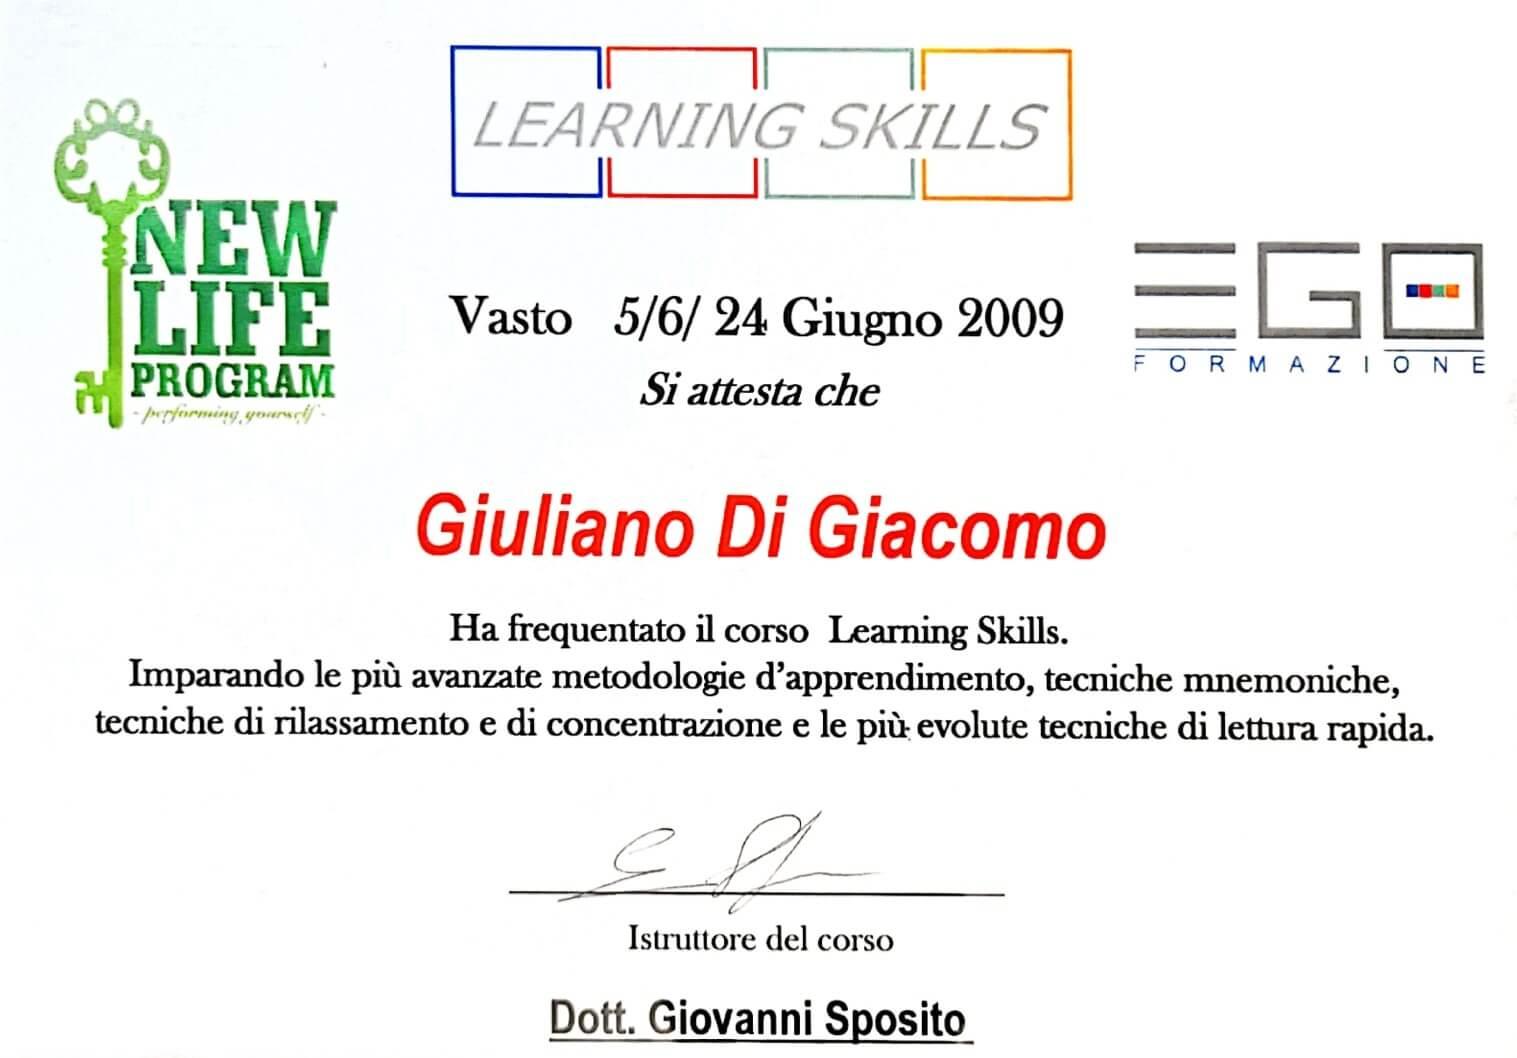 PNL learning skills